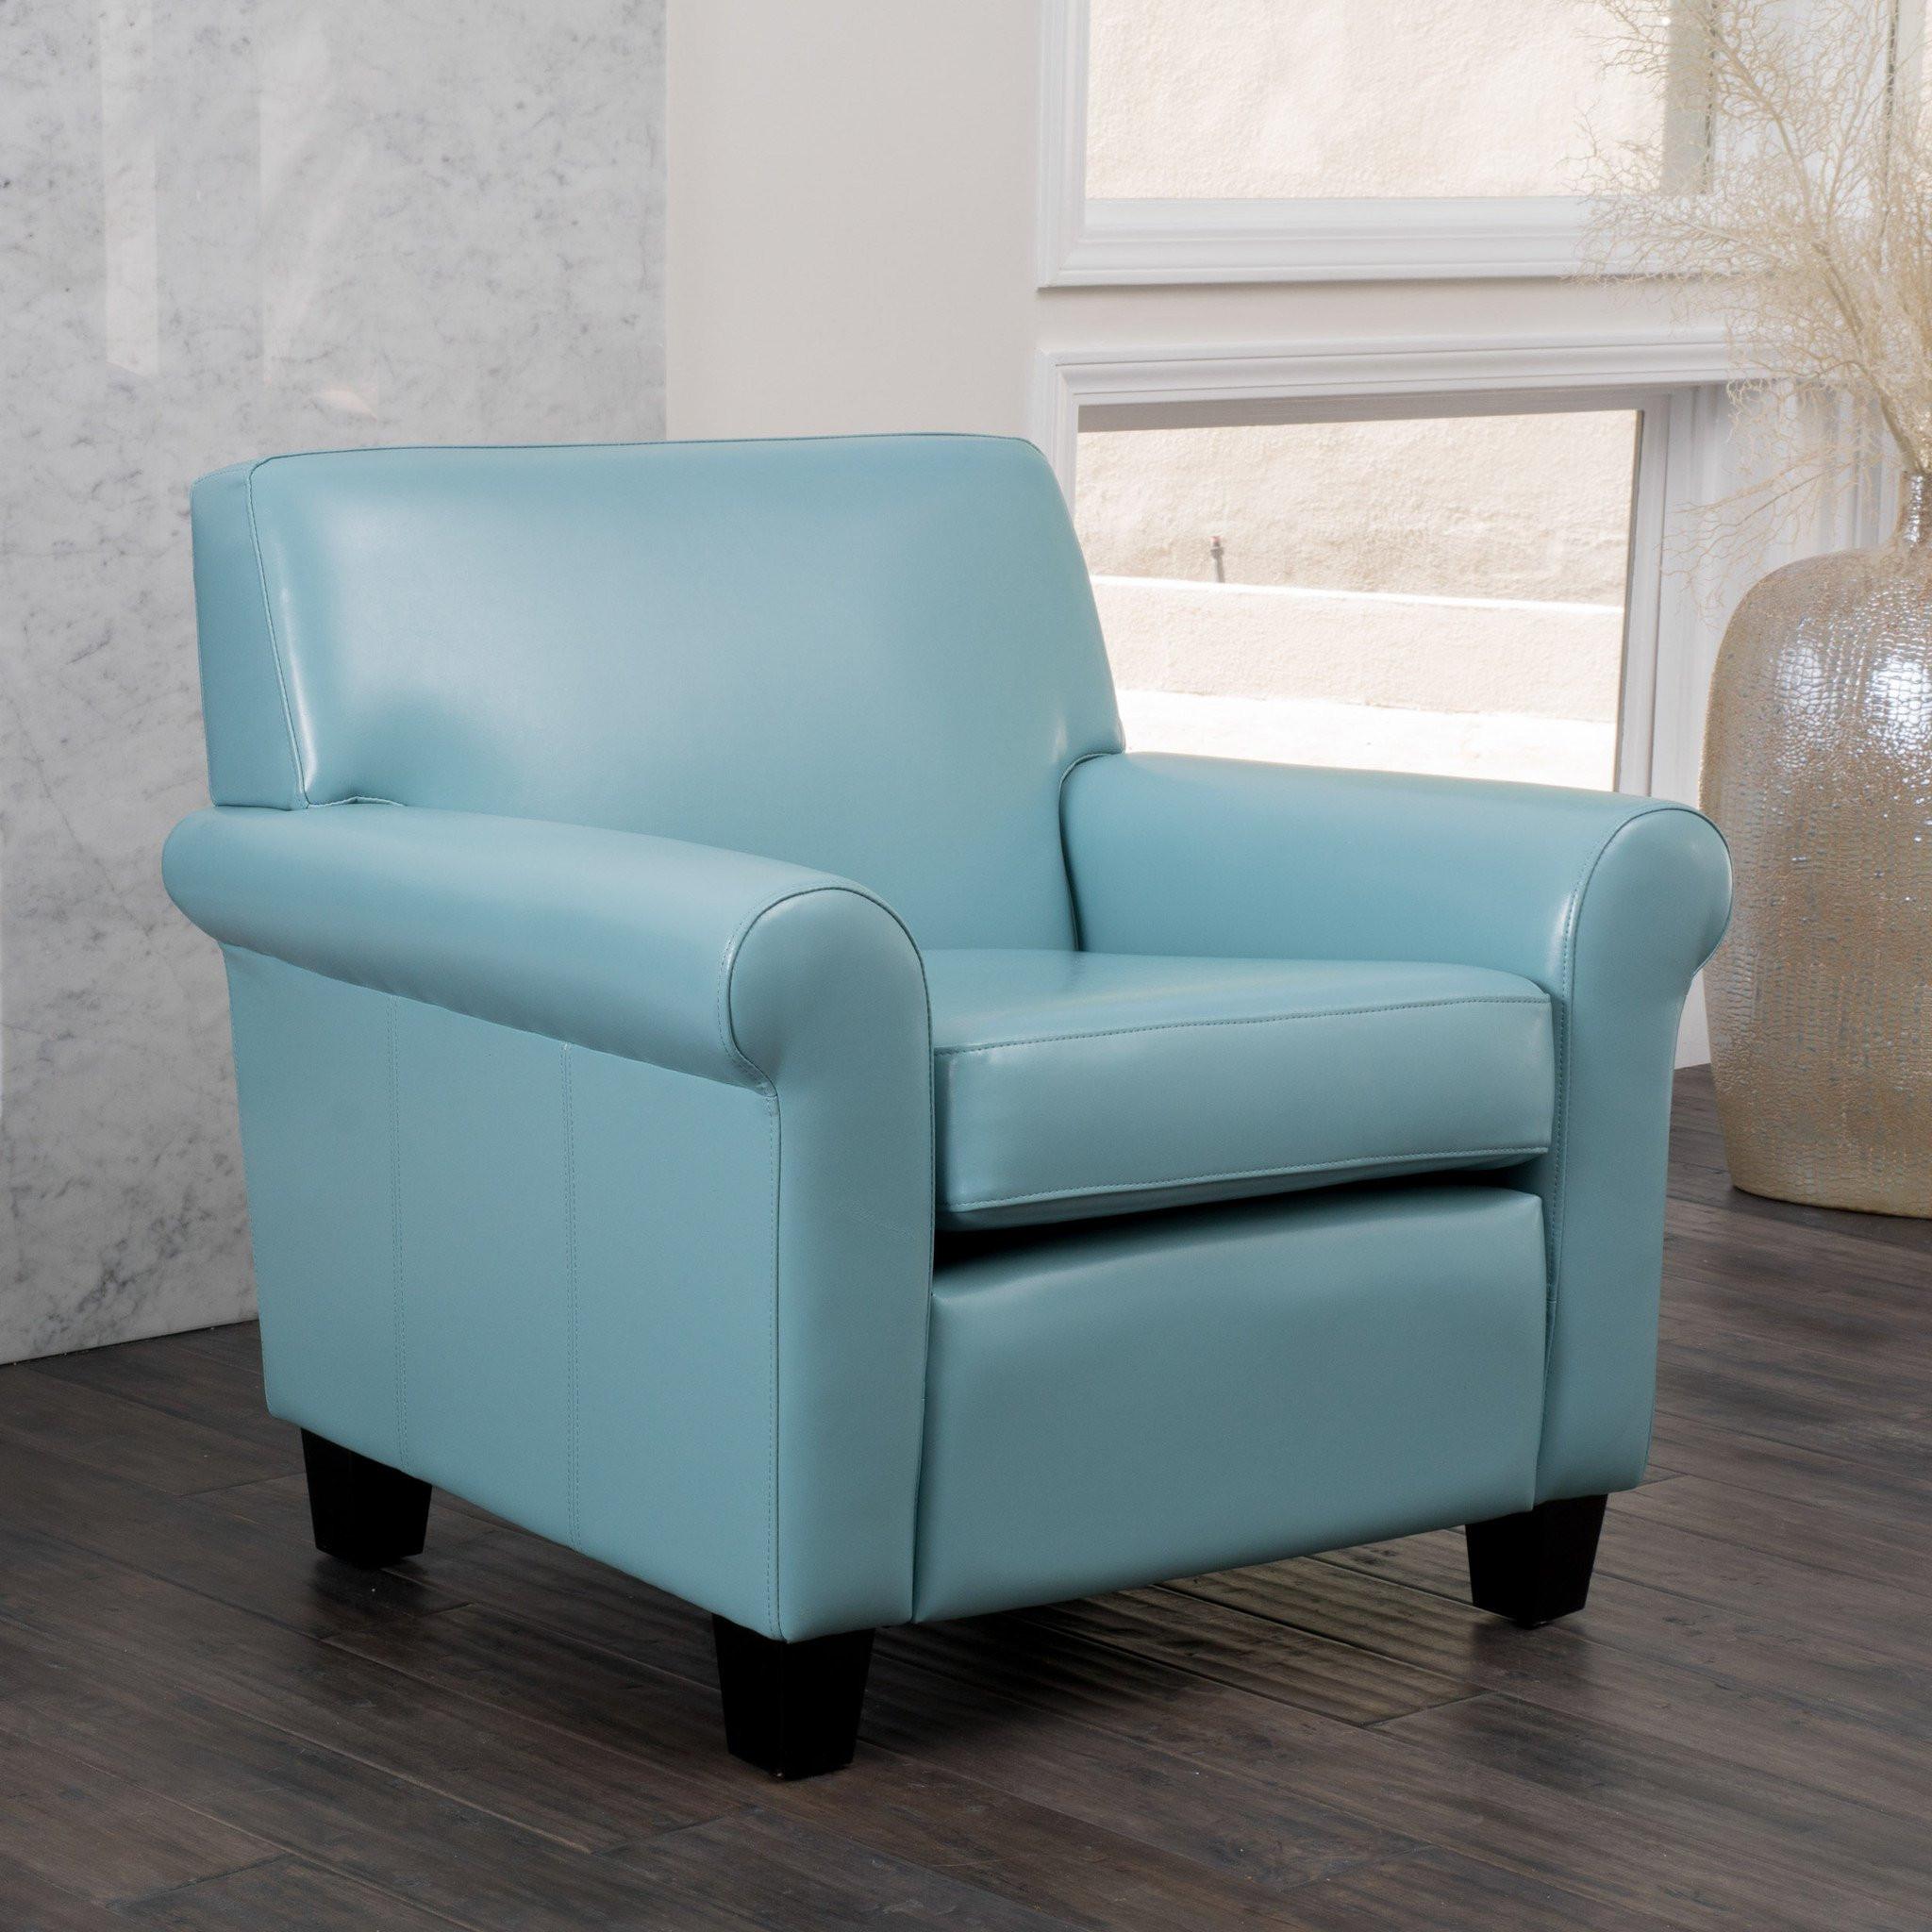 Addison Teal Blue Leather Club Chair